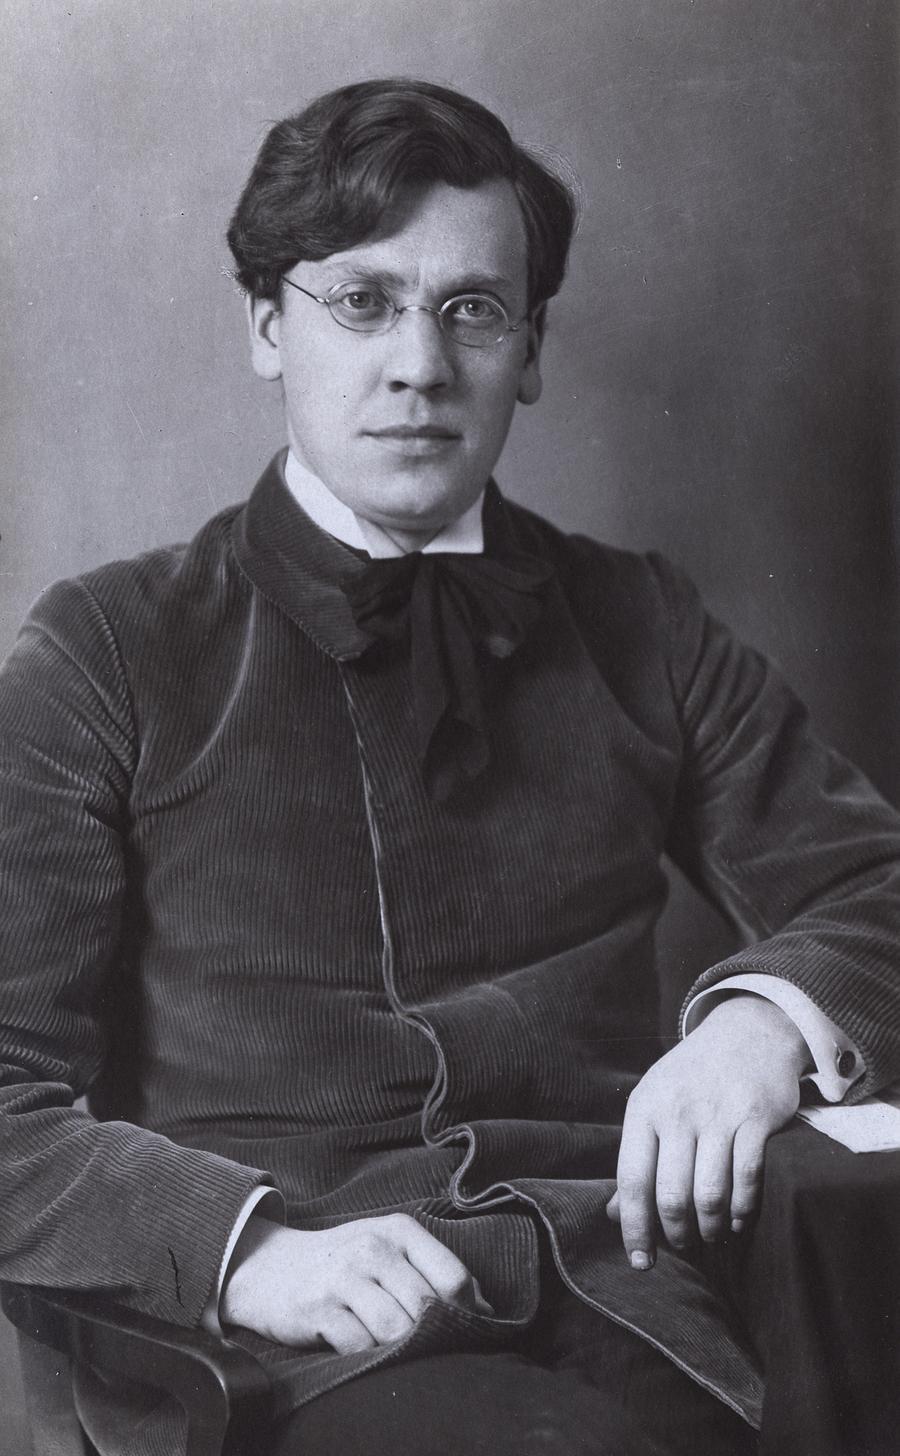 Raimund Kull